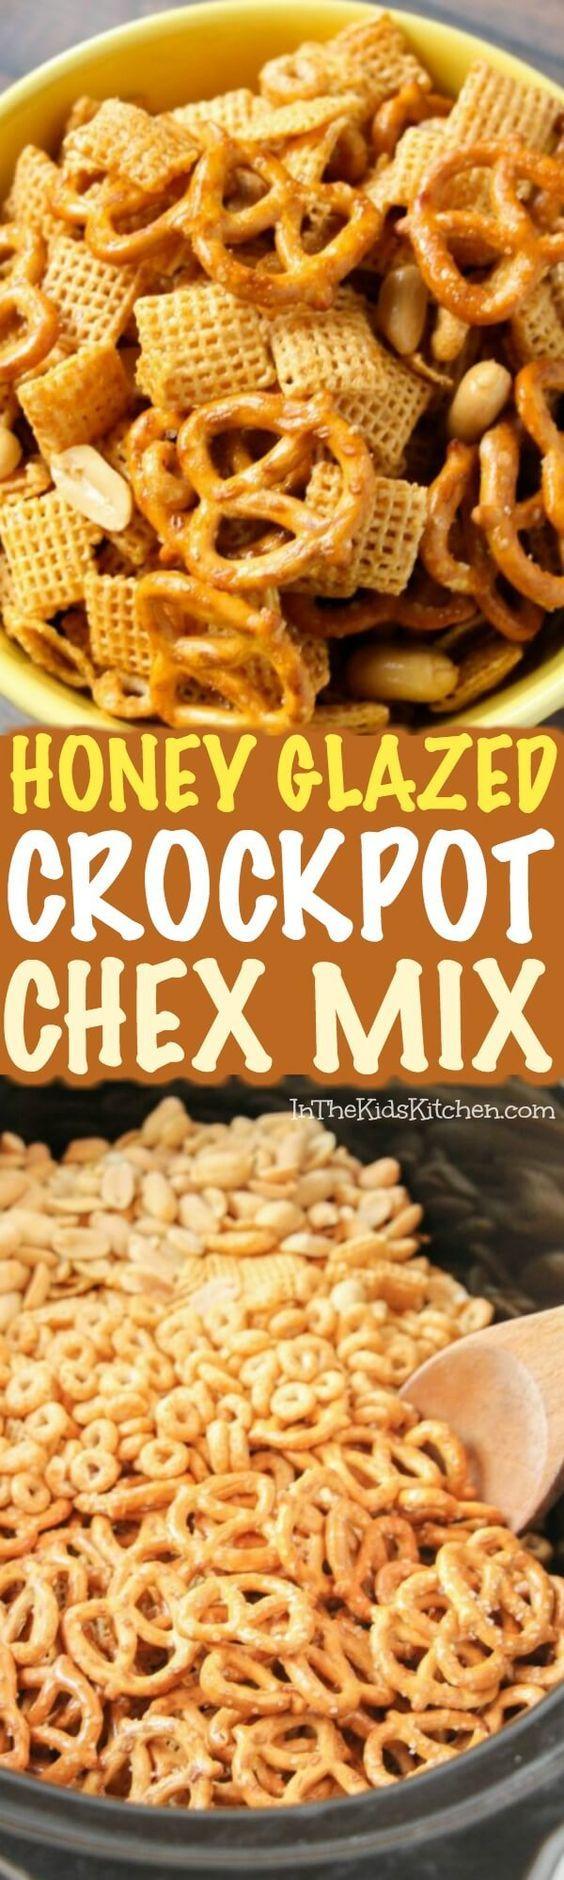 Honey Glazed Crockpot Chex Mix